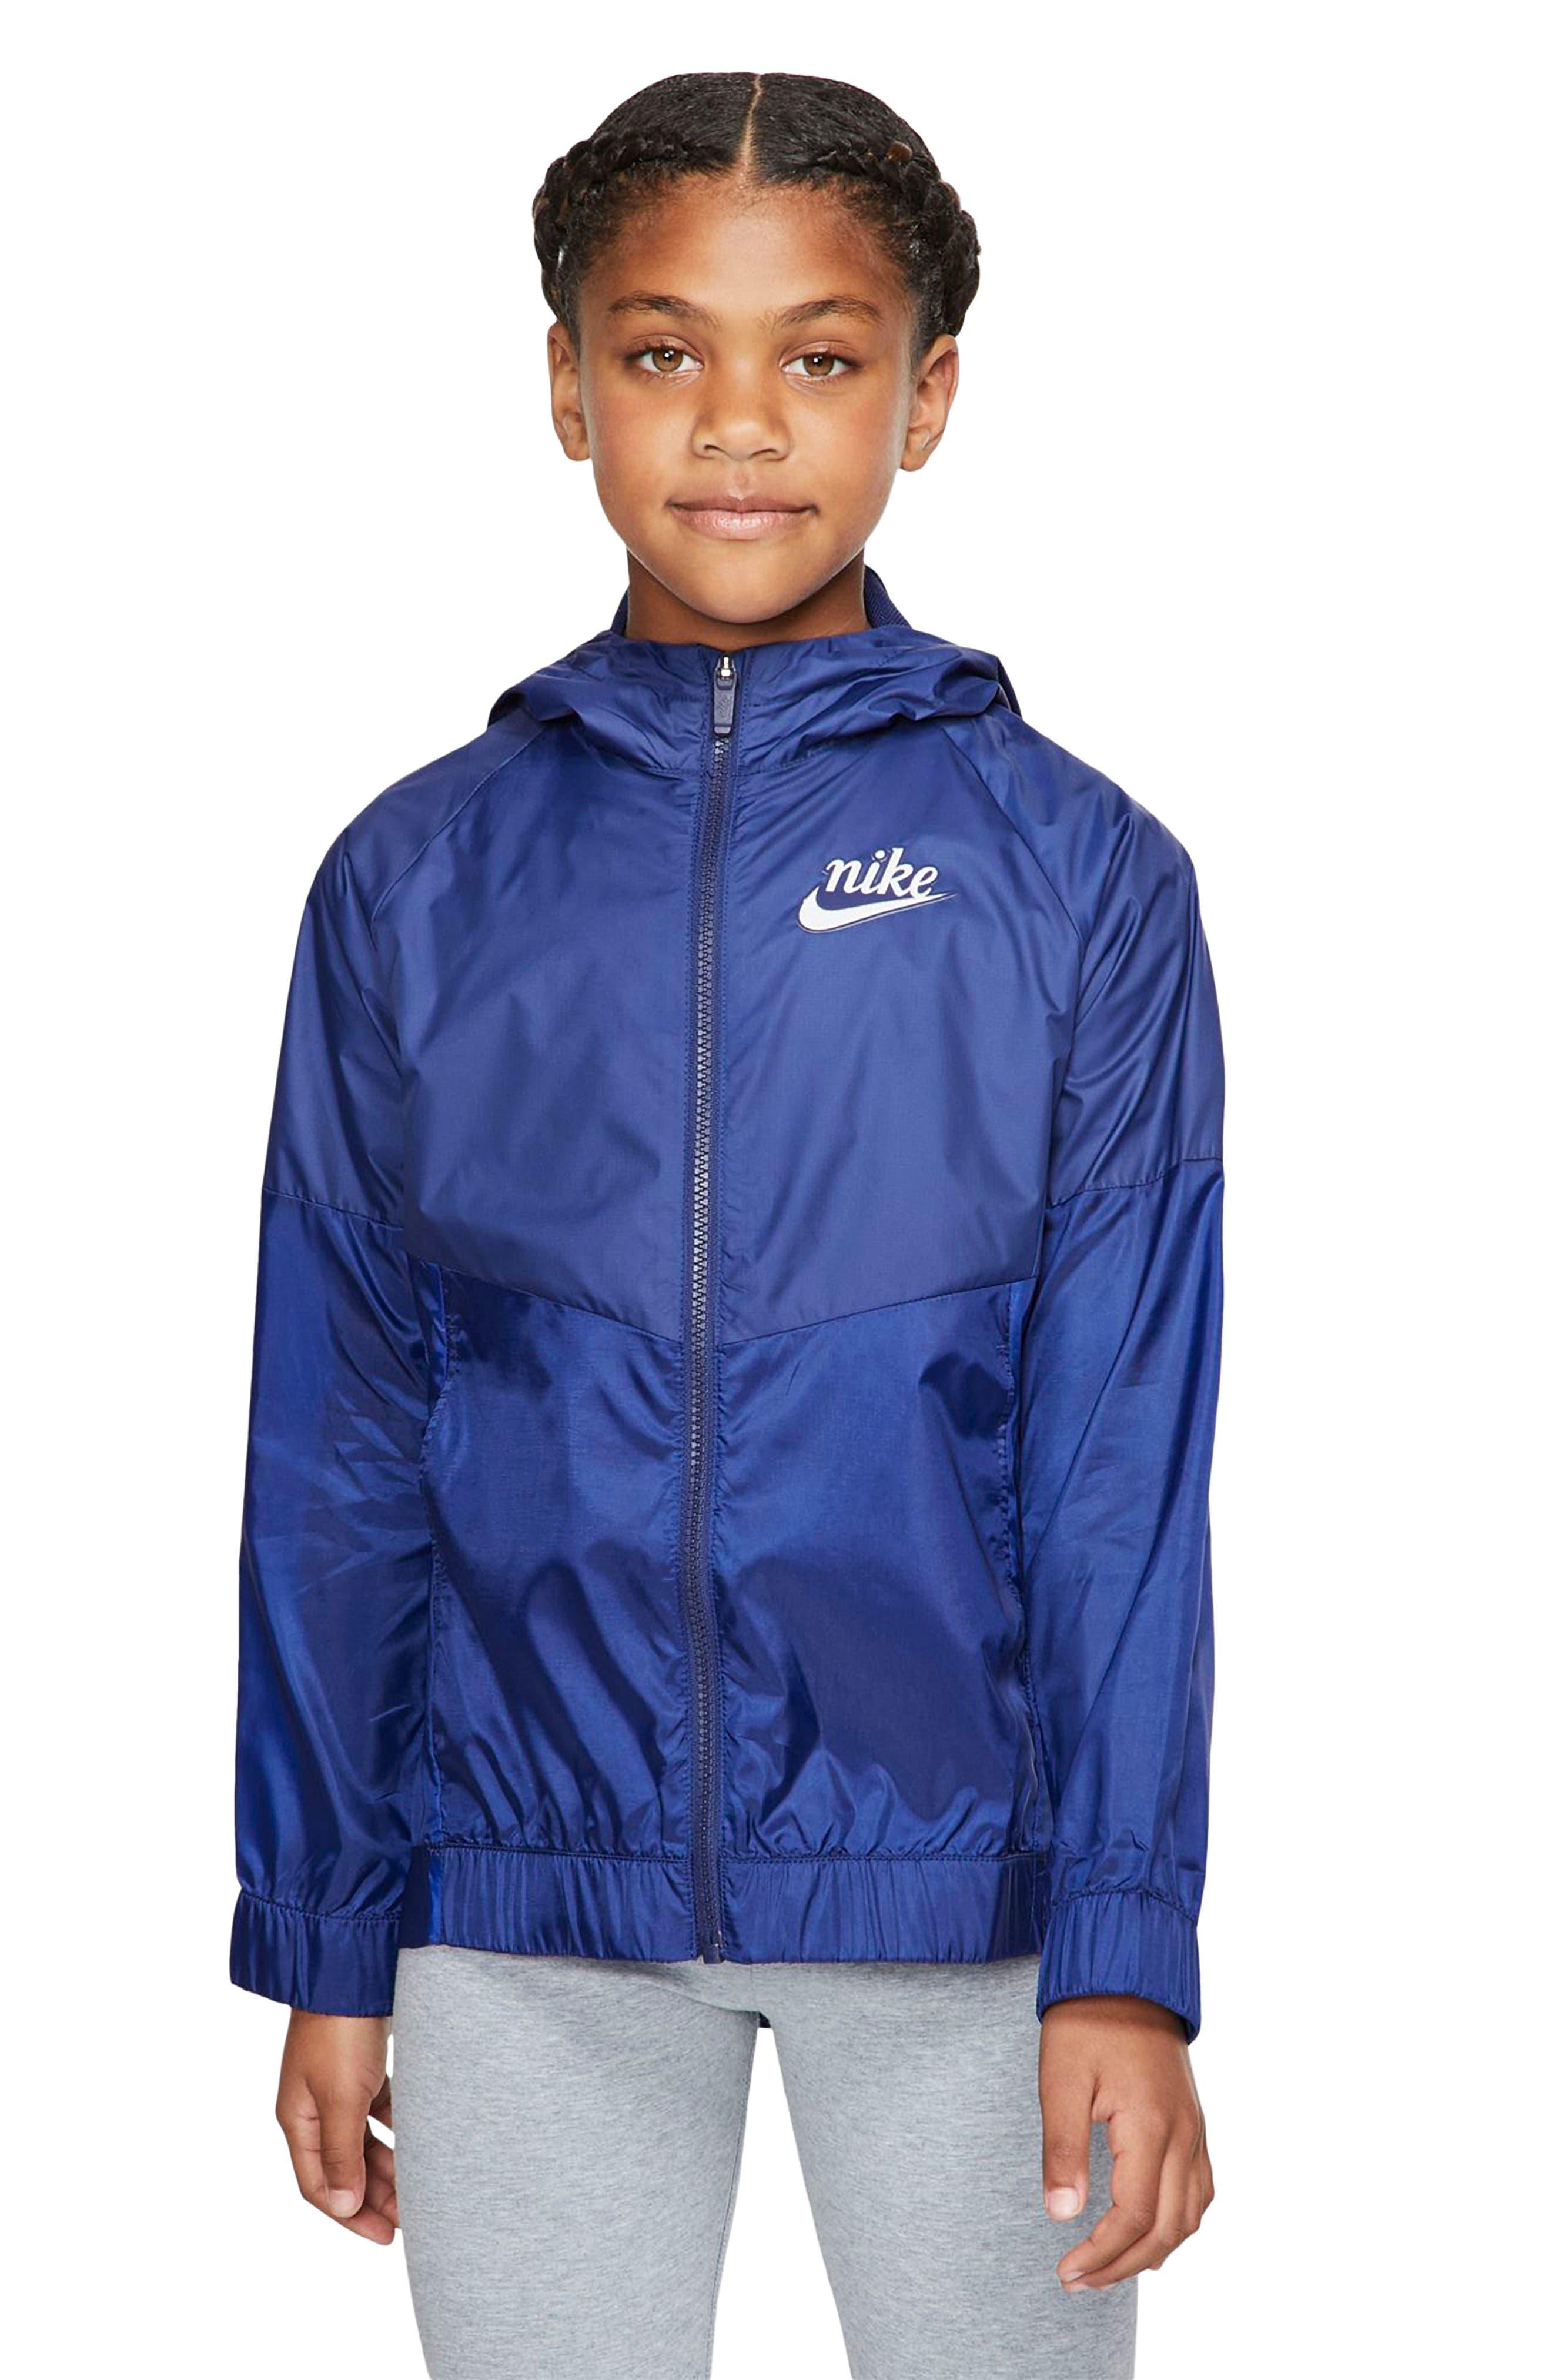 Girls Nike Windrunner Hooded Zip Jacket Size L (14)  Blue